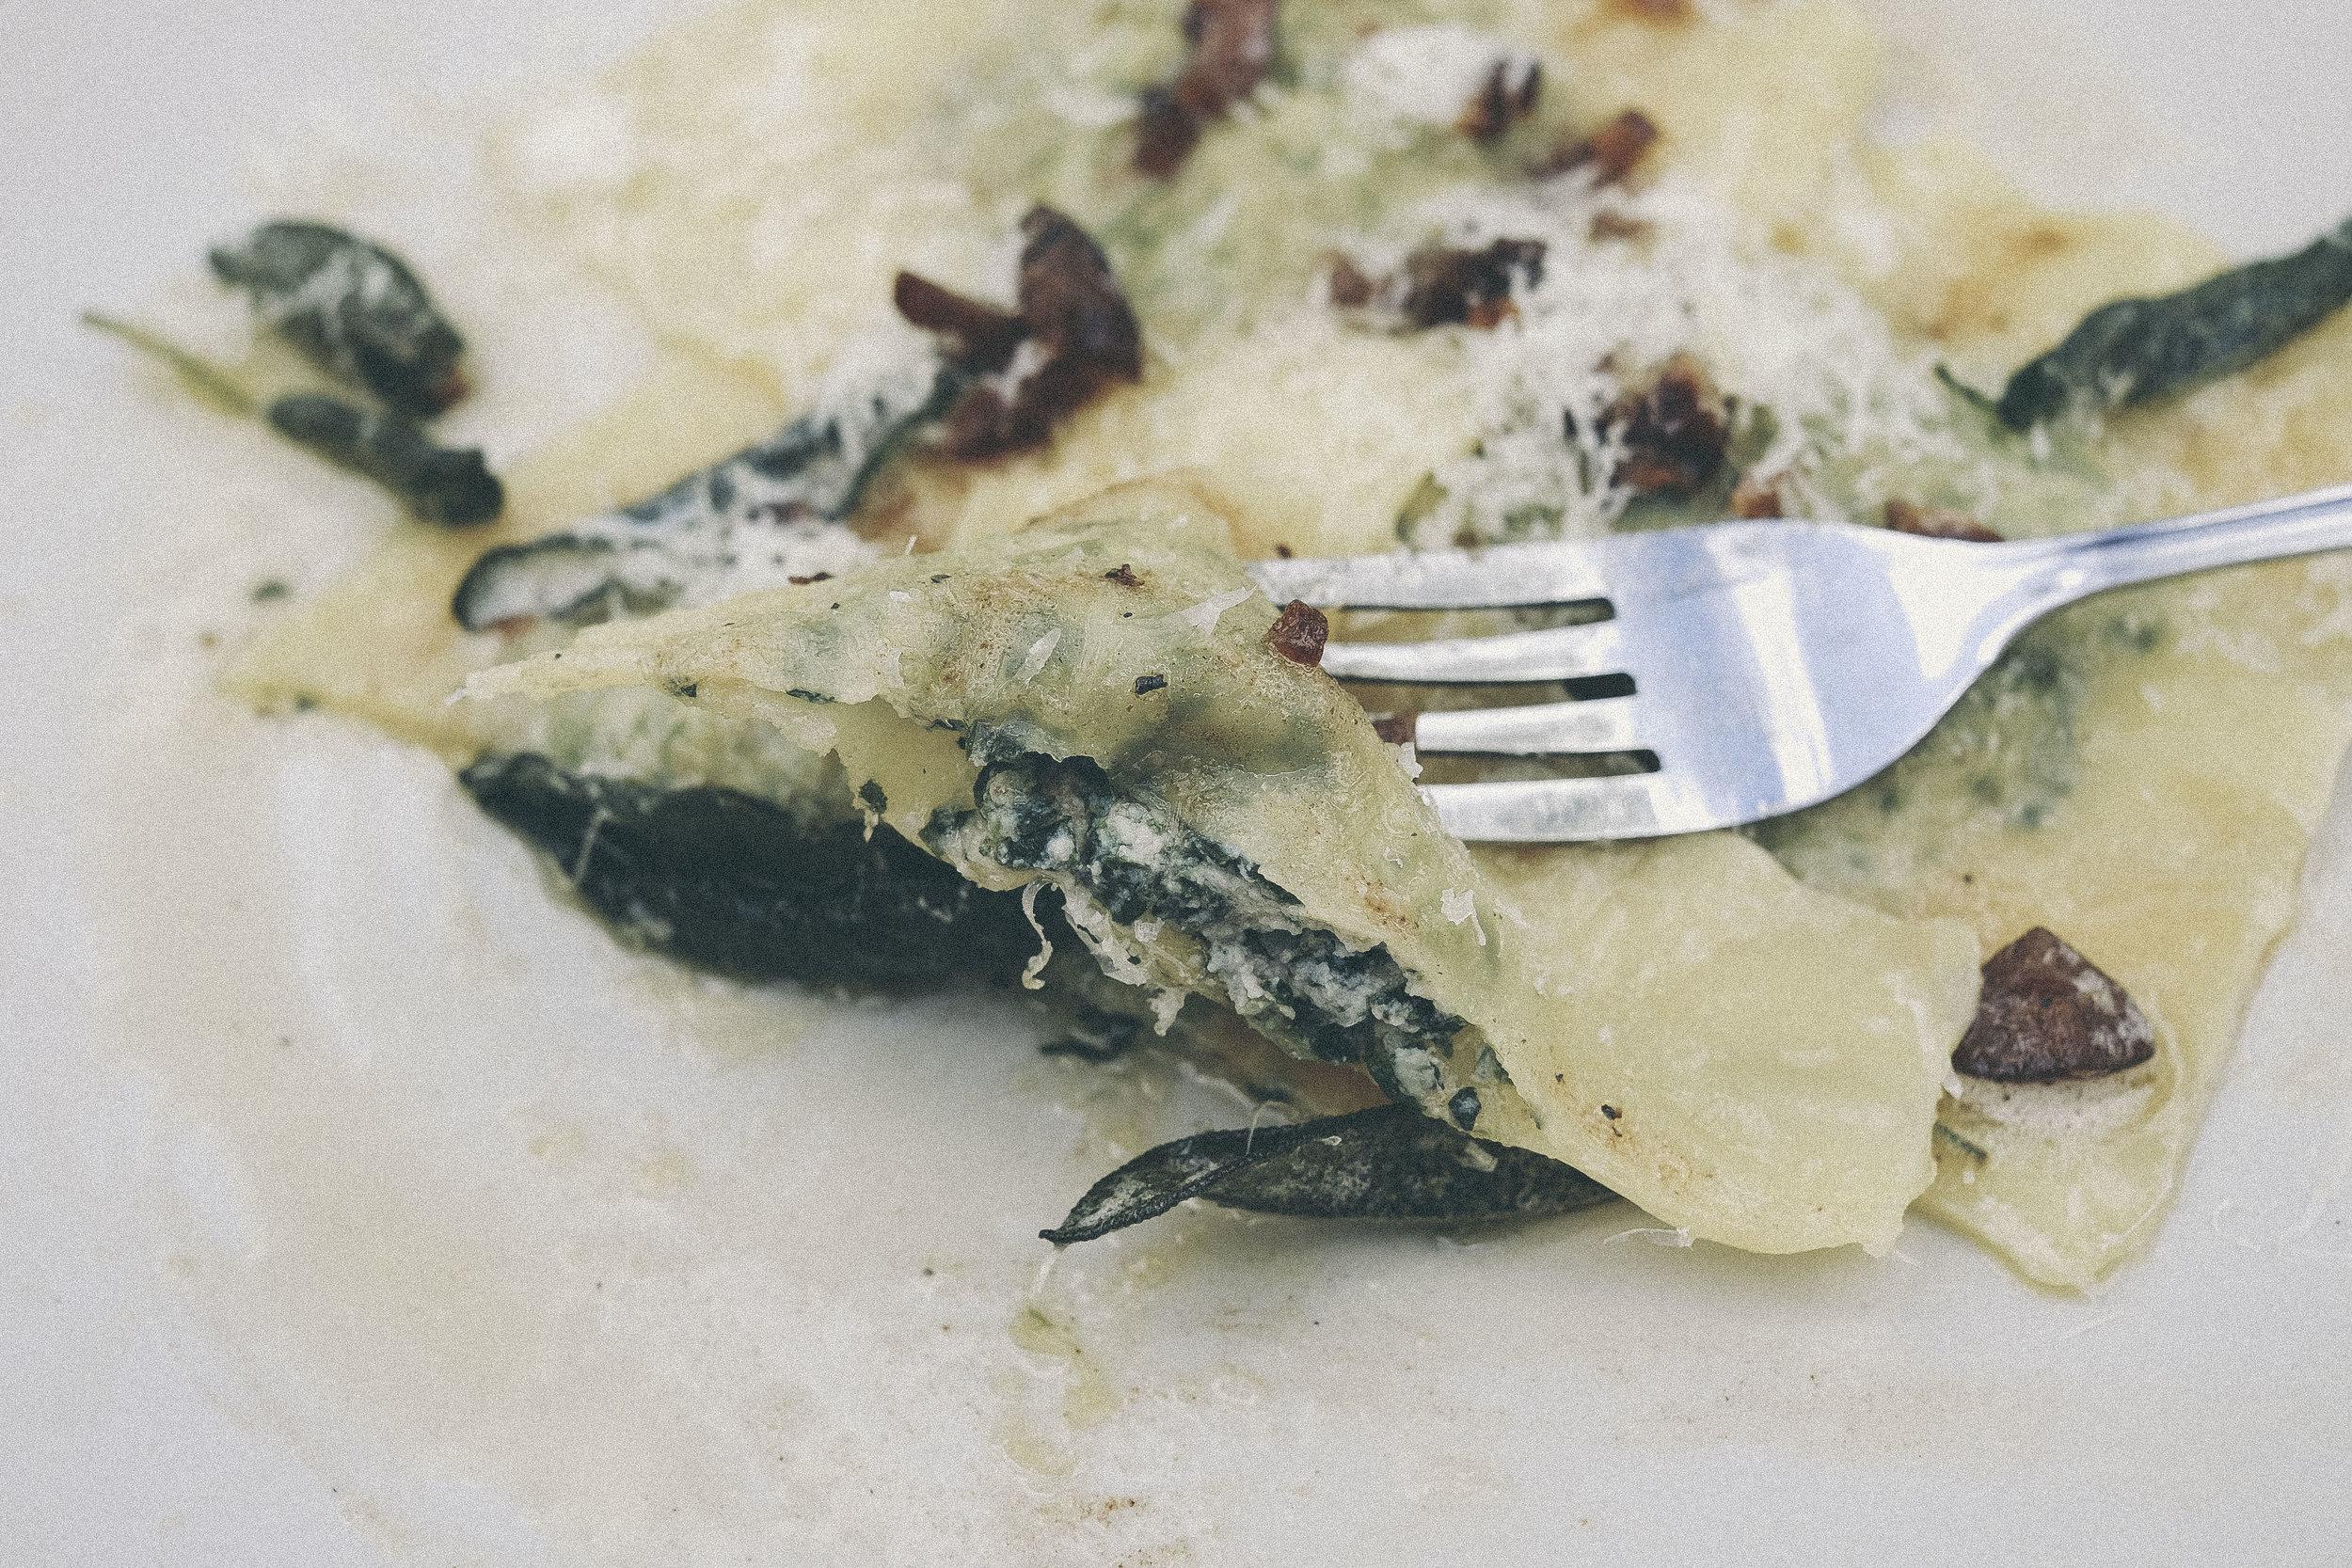 dérrive recipe - the most delicate chestnut, spinach and ricotta ravioli www.derrive.com